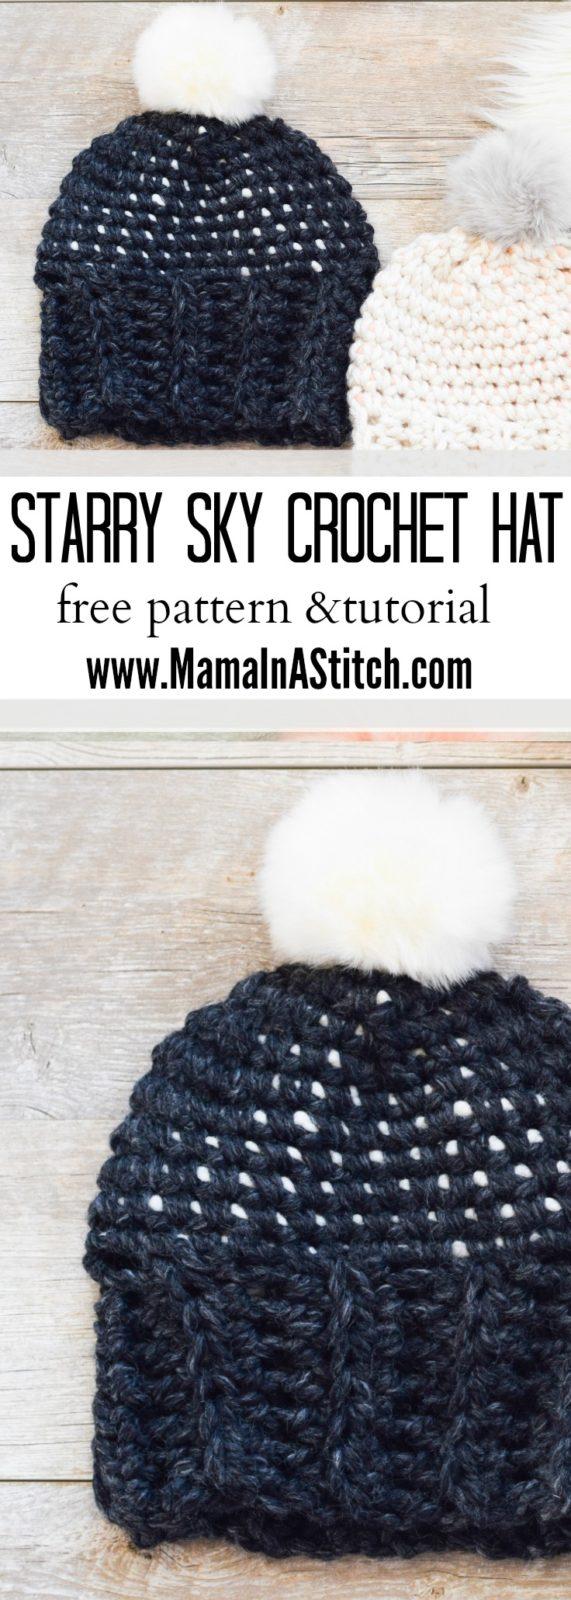 Starry Sky Crochet Hat Pattern – Mama In A Stitch